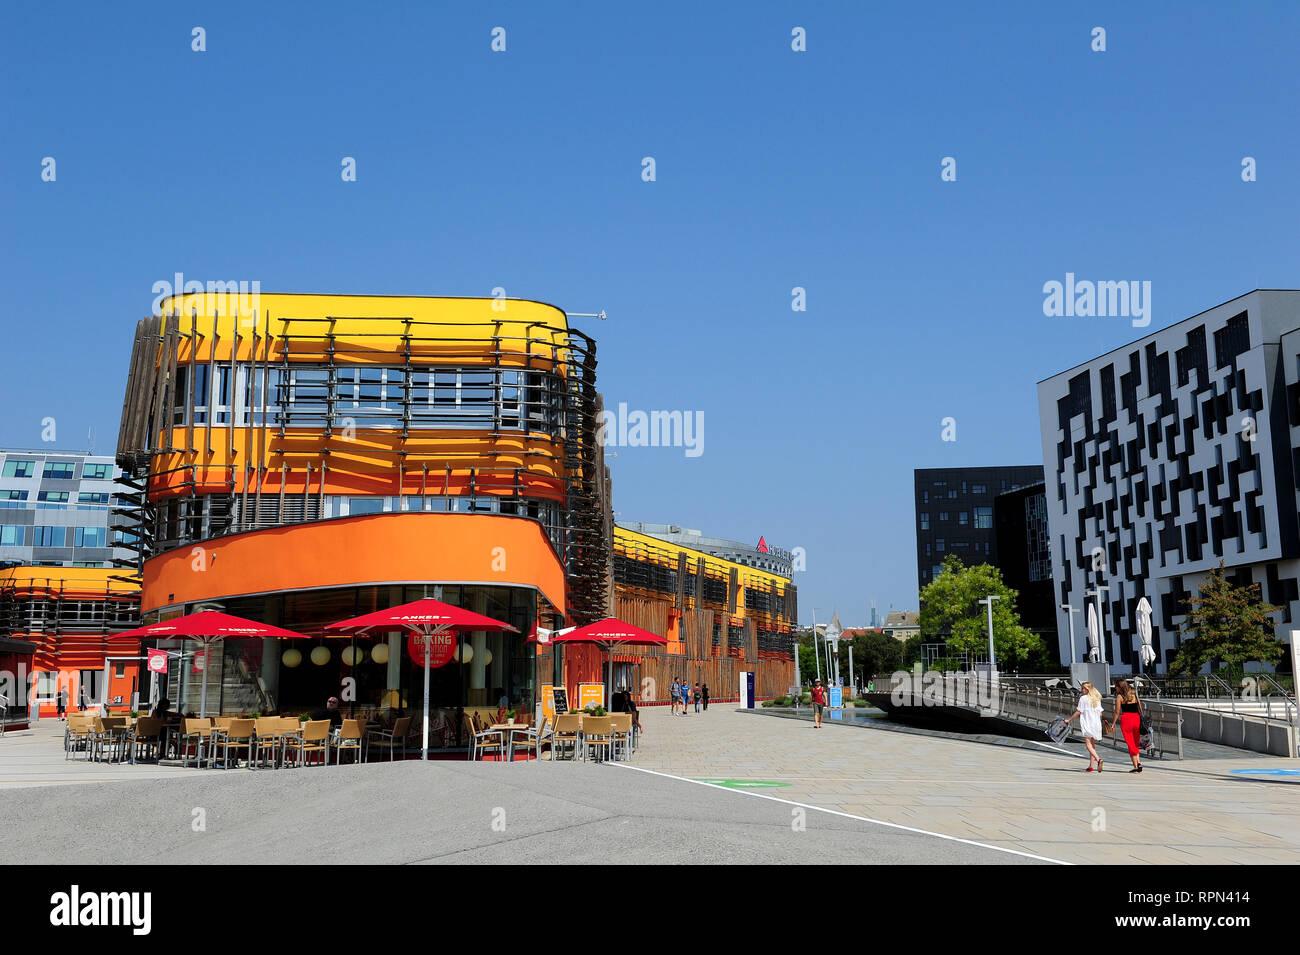 New Campus WU, Vienna University of Economics and Business, Vienna, Austria - Stock Image